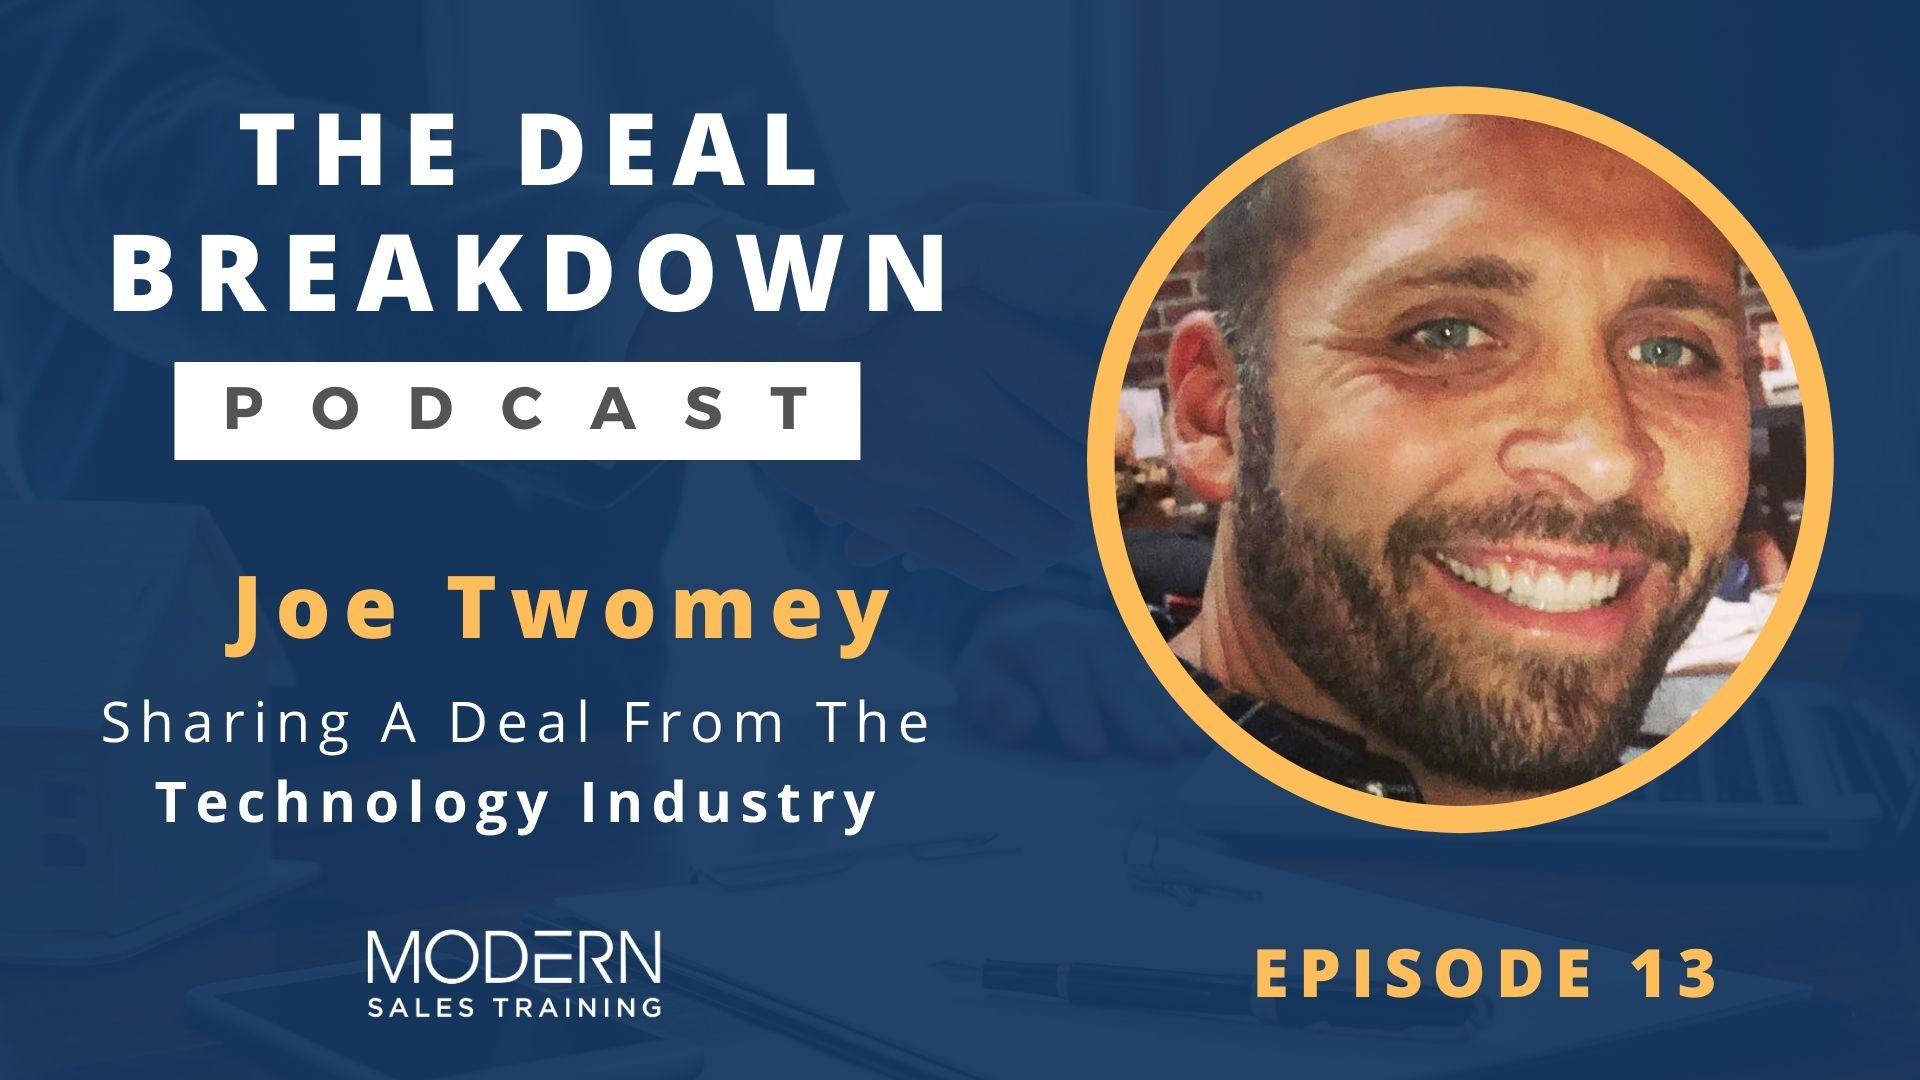 The-Deal-Breakdown-Podcast-Modern-Sales-Training-Joe-Twomey